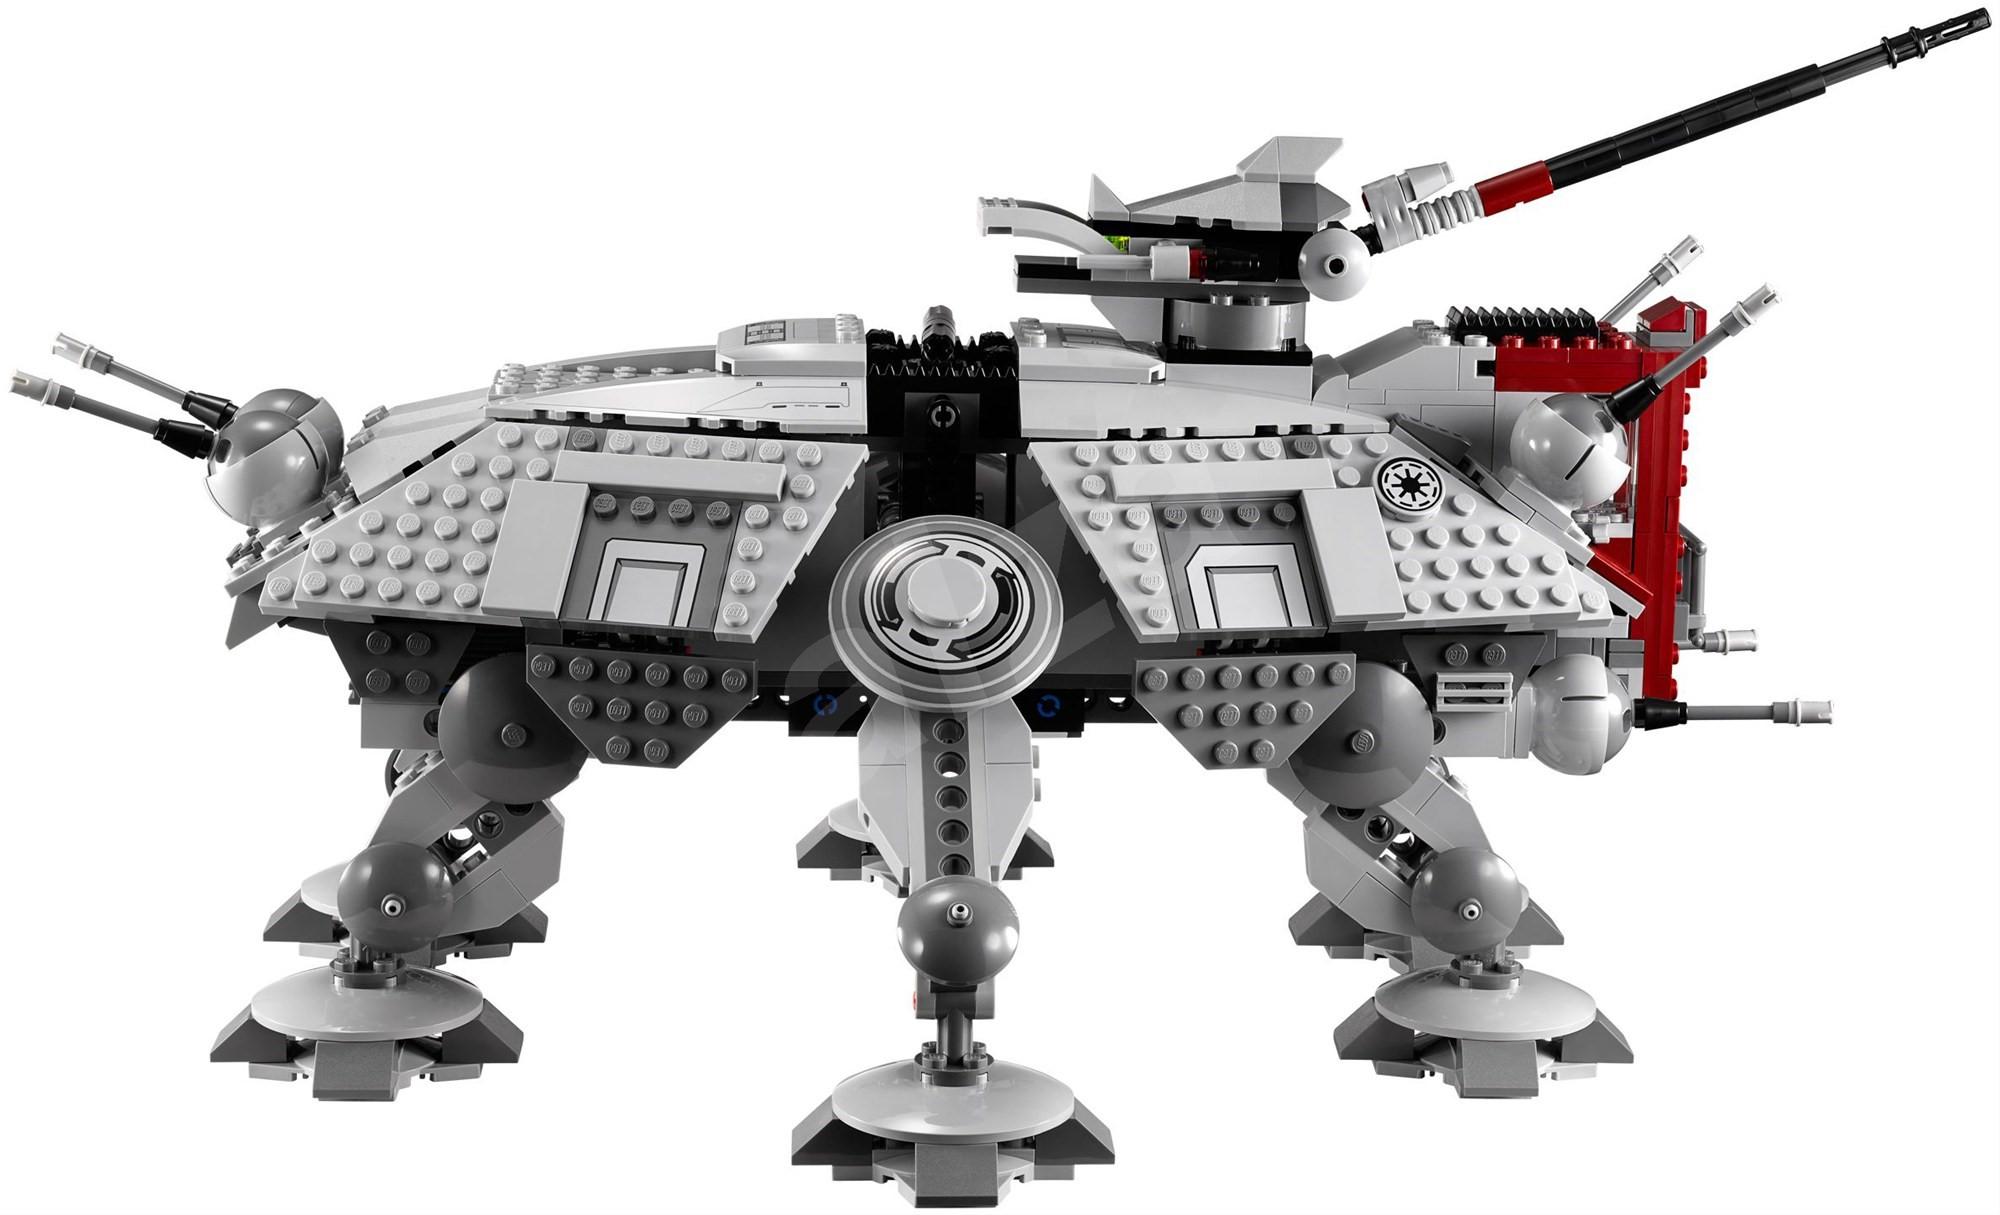 Lego star wars 75019 at te building kit - Lego star warse ...